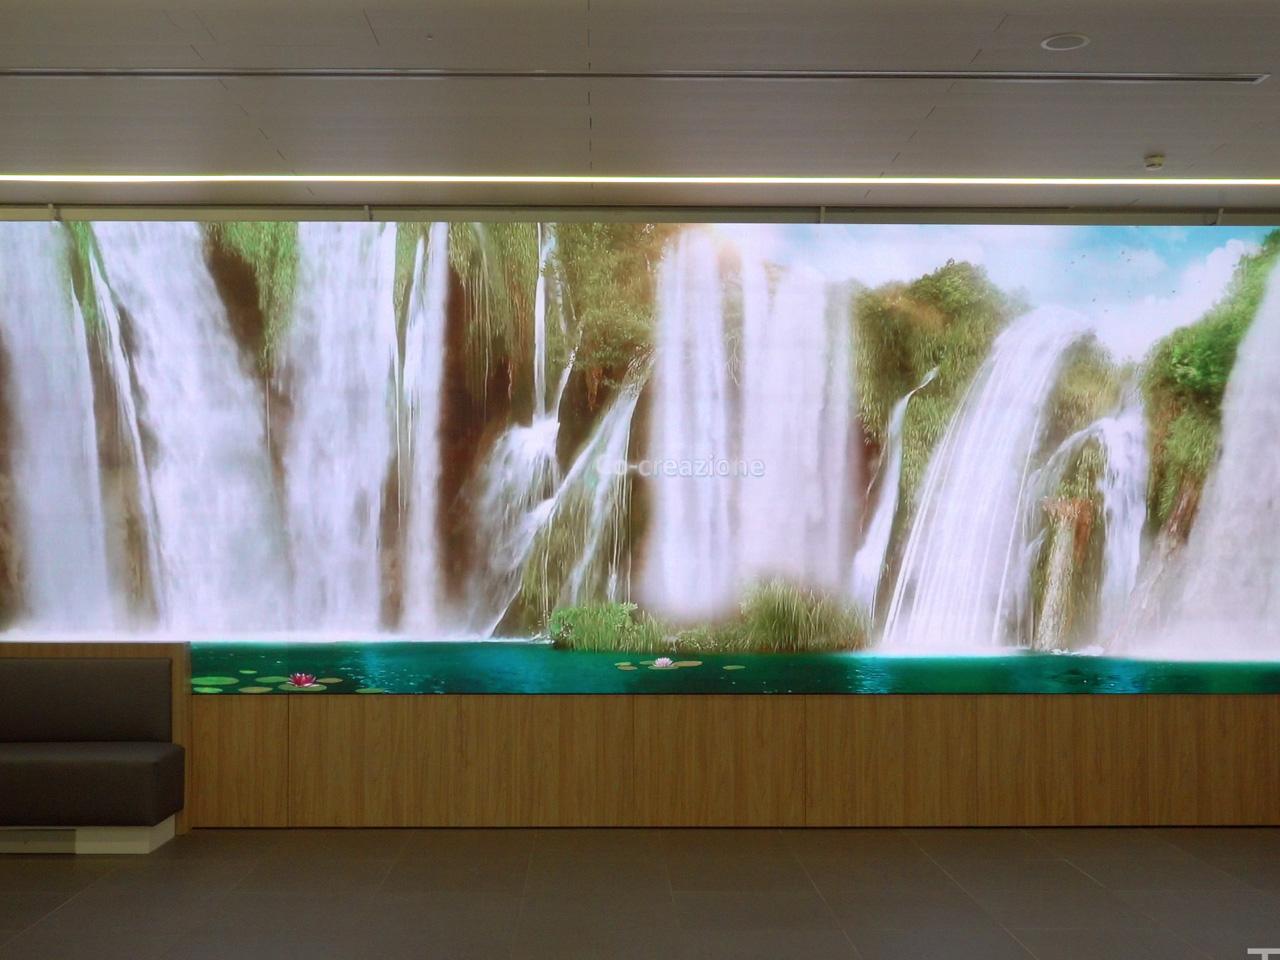 Siemens-ledwall-sala-attesa-corporate-corporate-1280x960-4